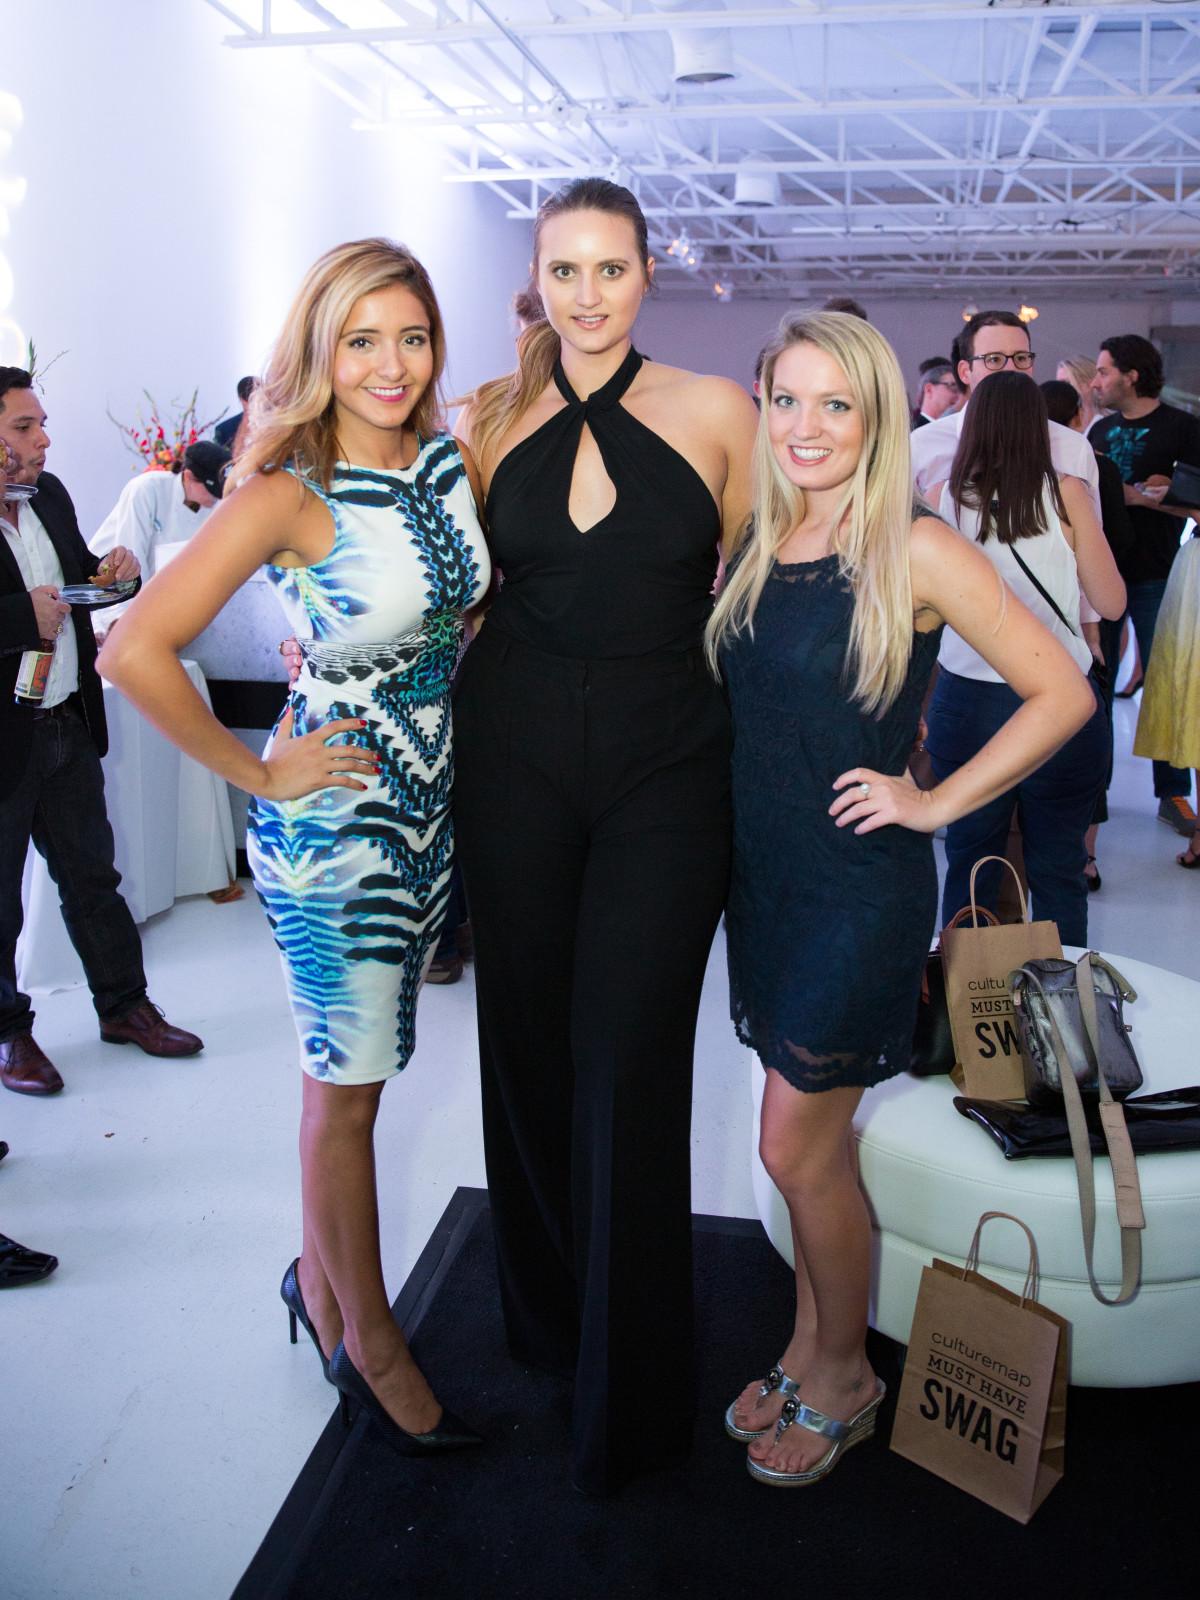 Valeria Rodriguez, Jessica Carbone, Haley Jo Schwab